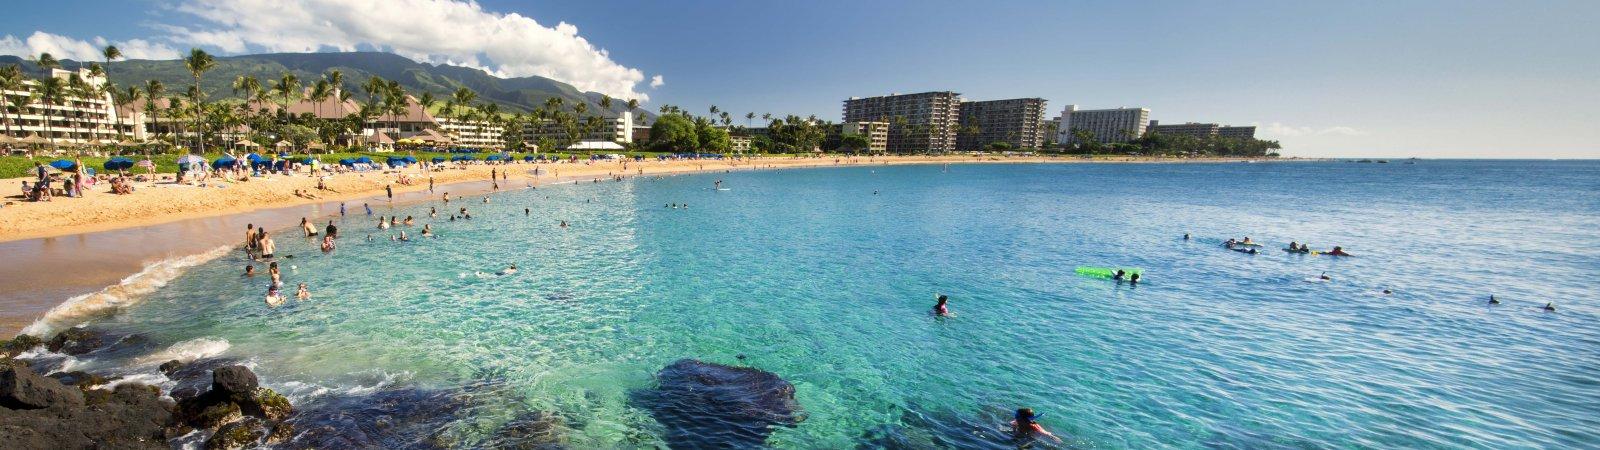 Maui Shared Ownership Real Estate